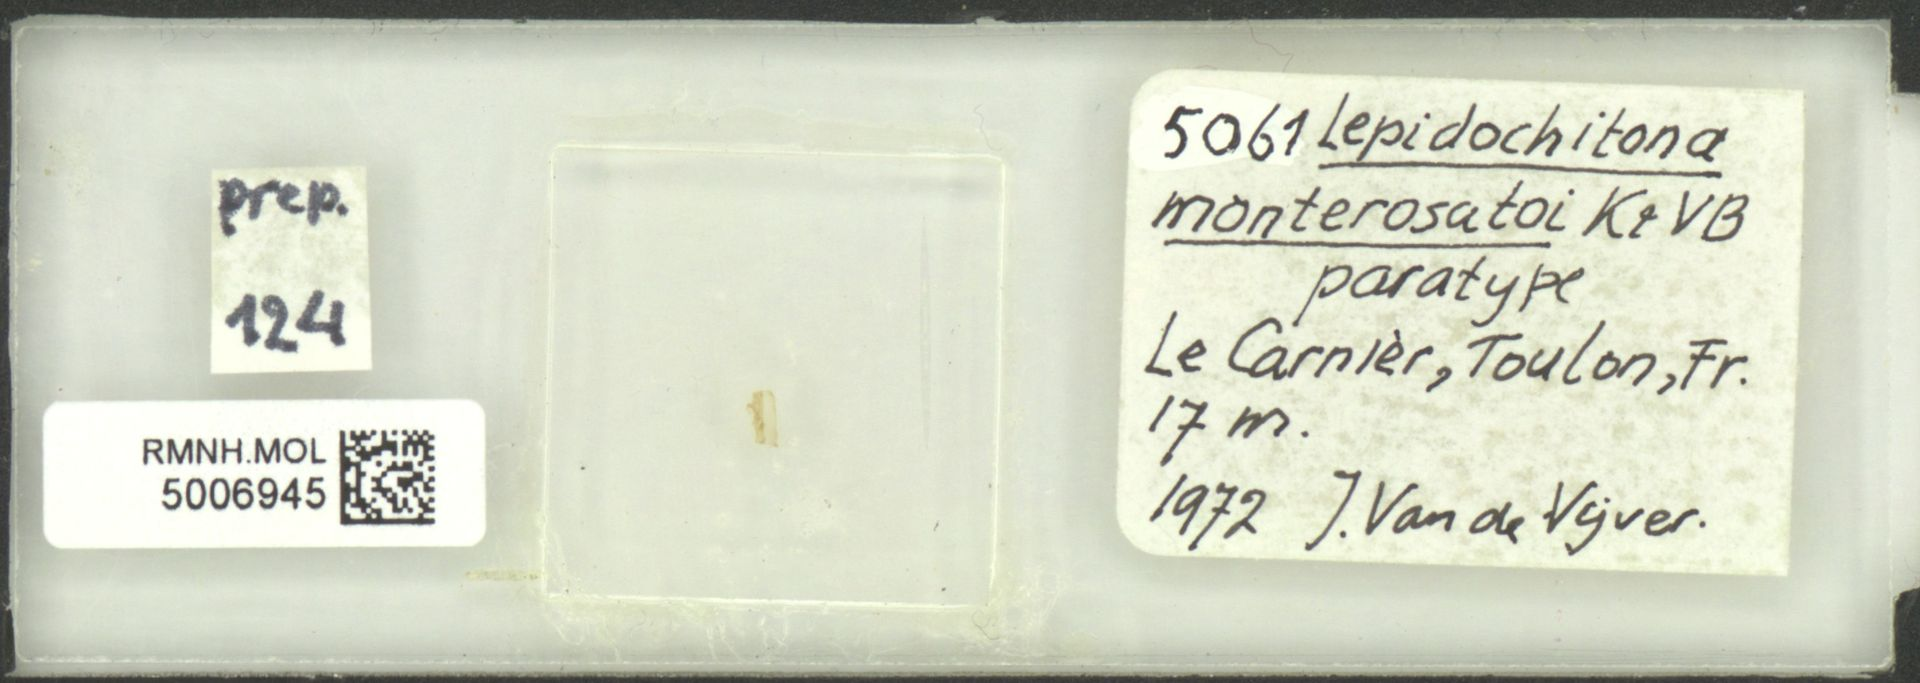 RMNH.MOL.5006945 | Lepidochitona (Lepidochitona) monterosatoi Kaas & Van Belle, 1981